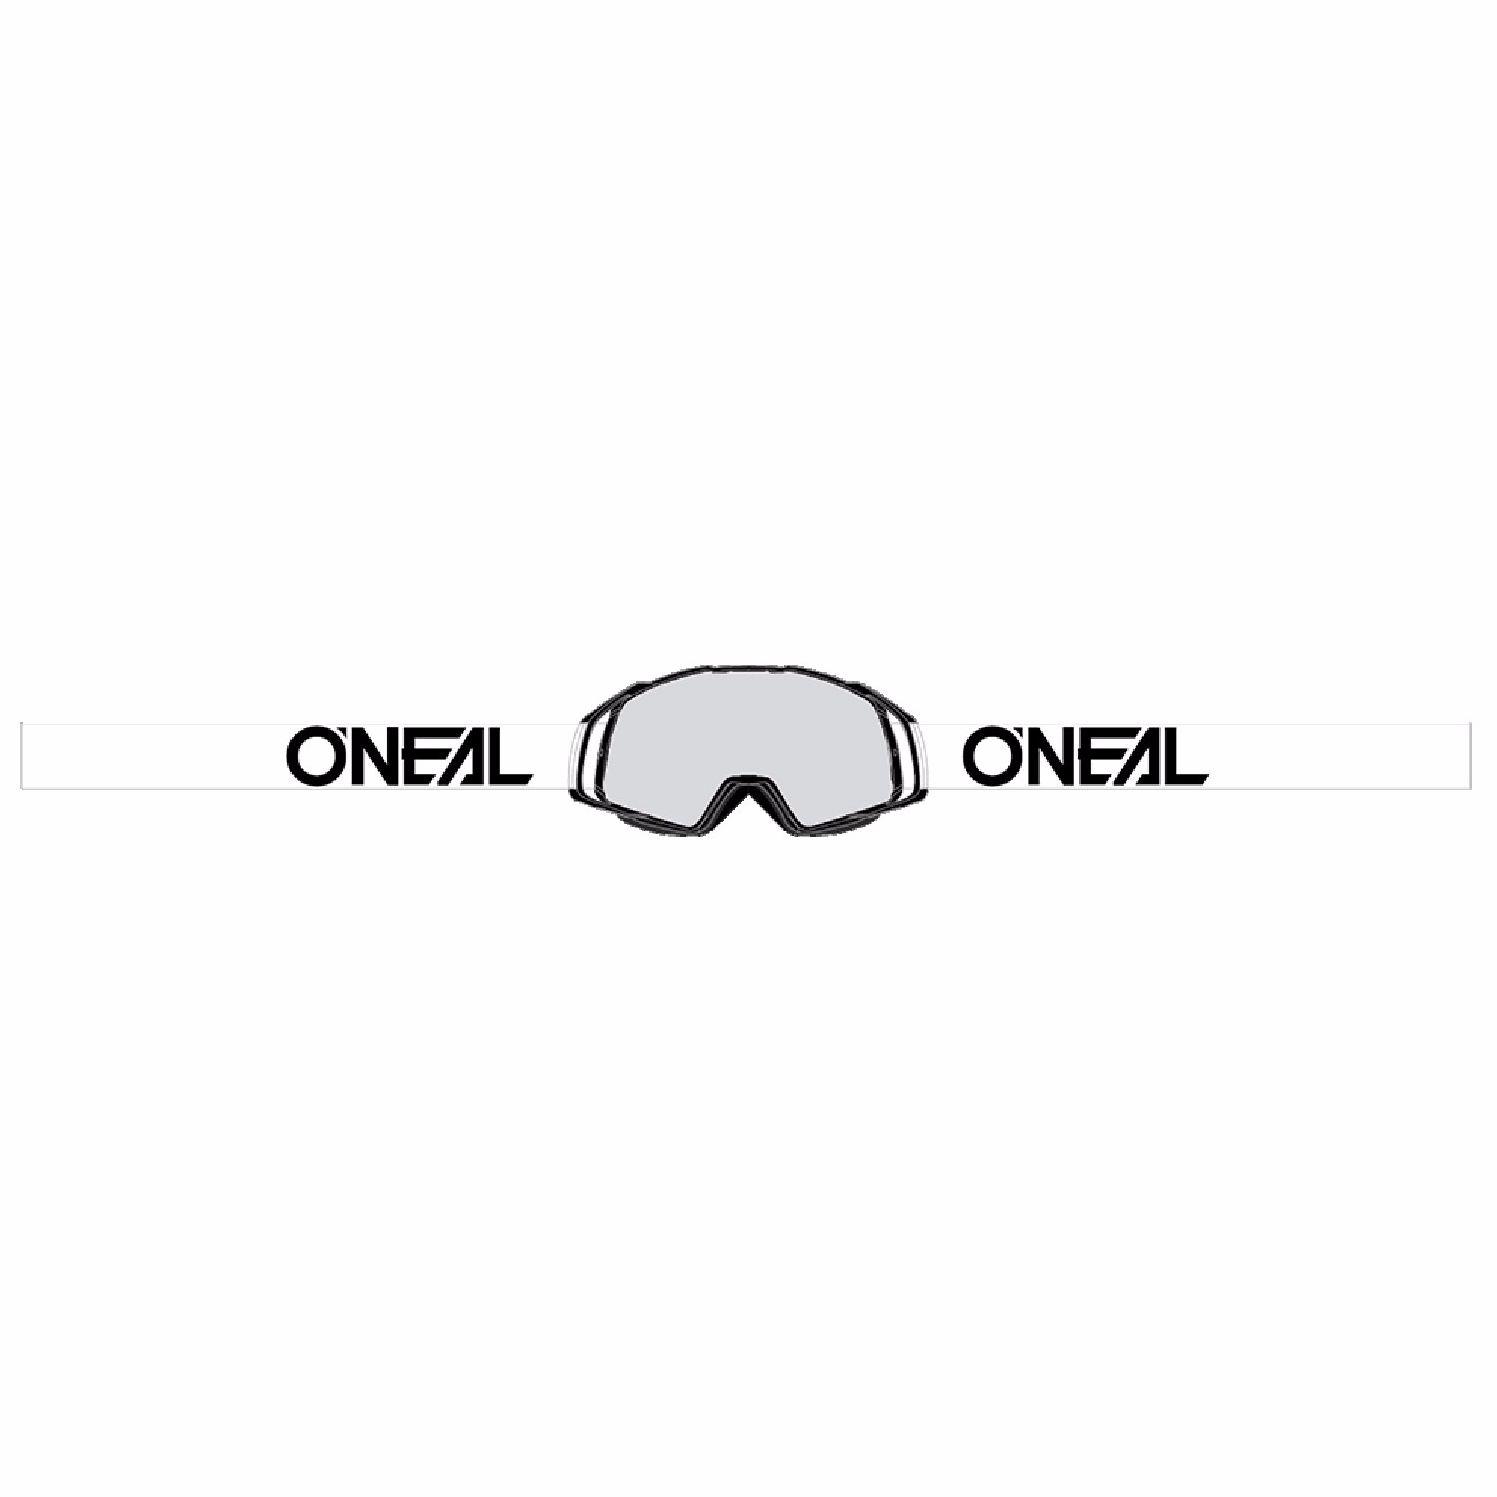 Masque Cross O'neal B-20 - Flat Noir Blanc - Ecran Clair -